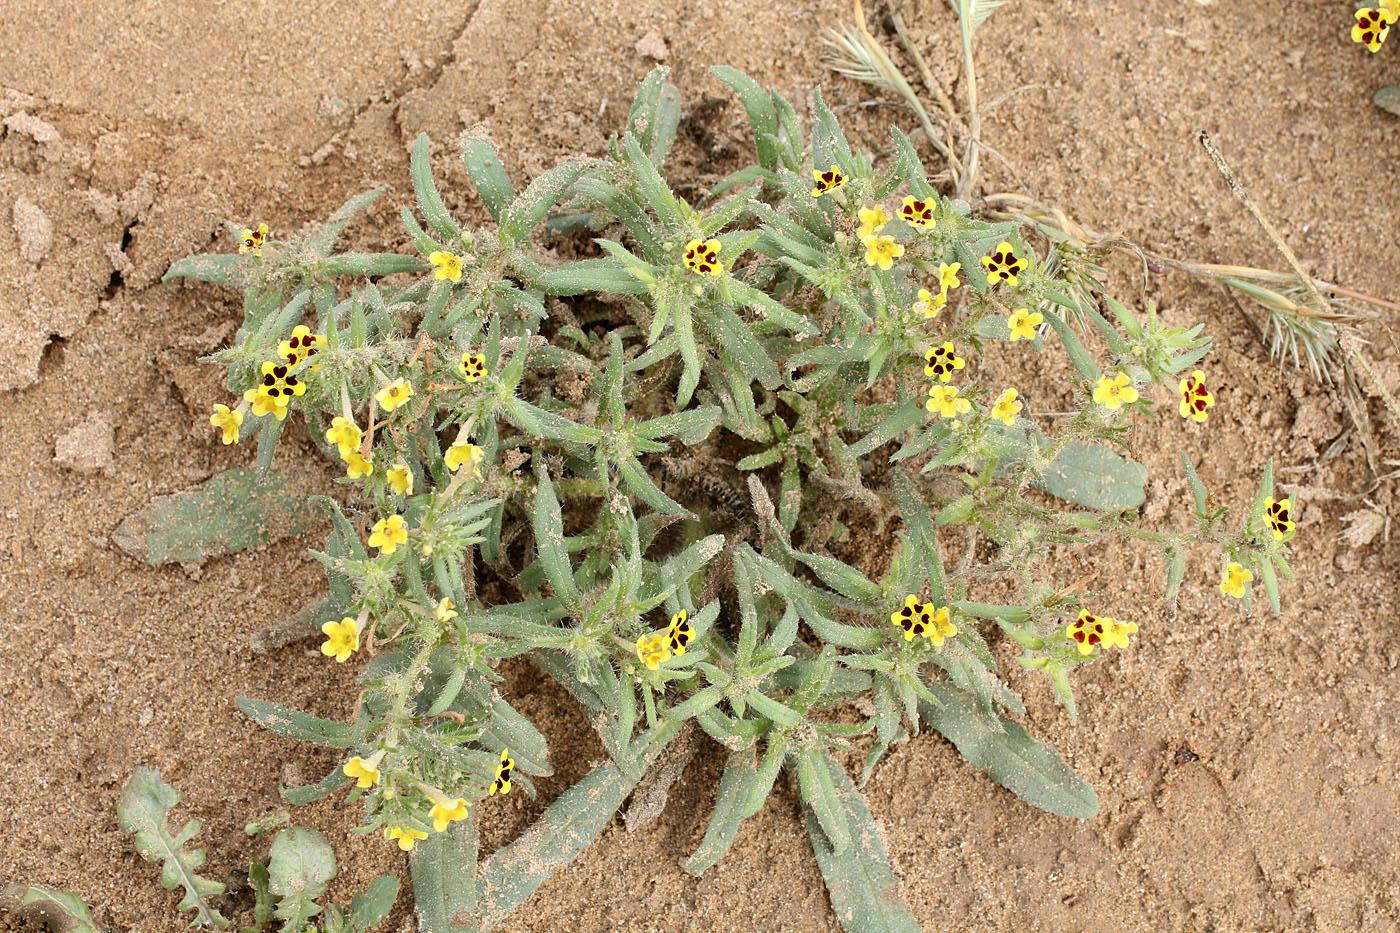 Изображение особи Arnebia decumbens.